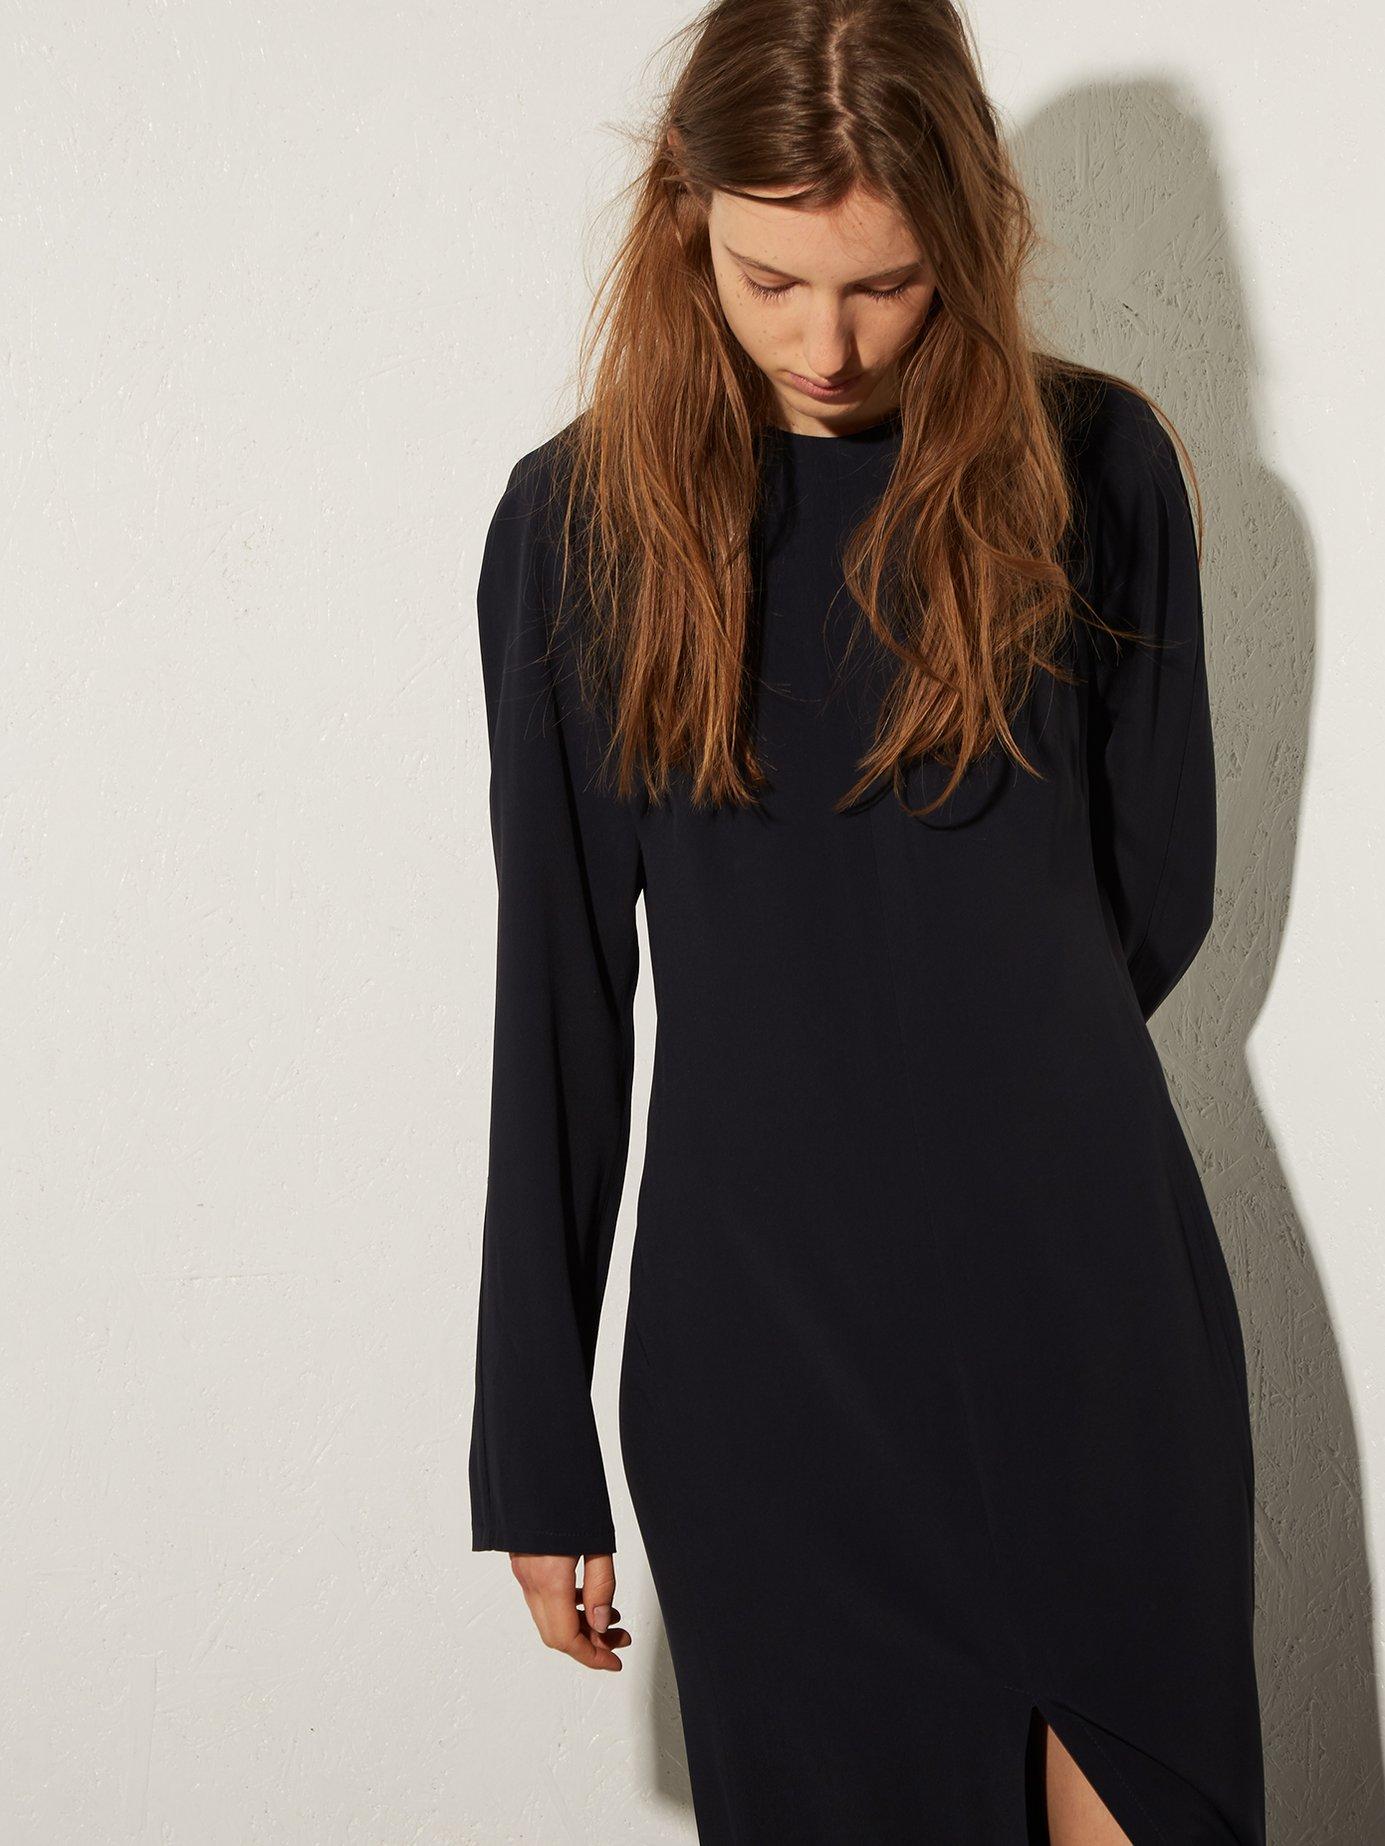 Long-sleeved split-front crepe midi dress by Raey